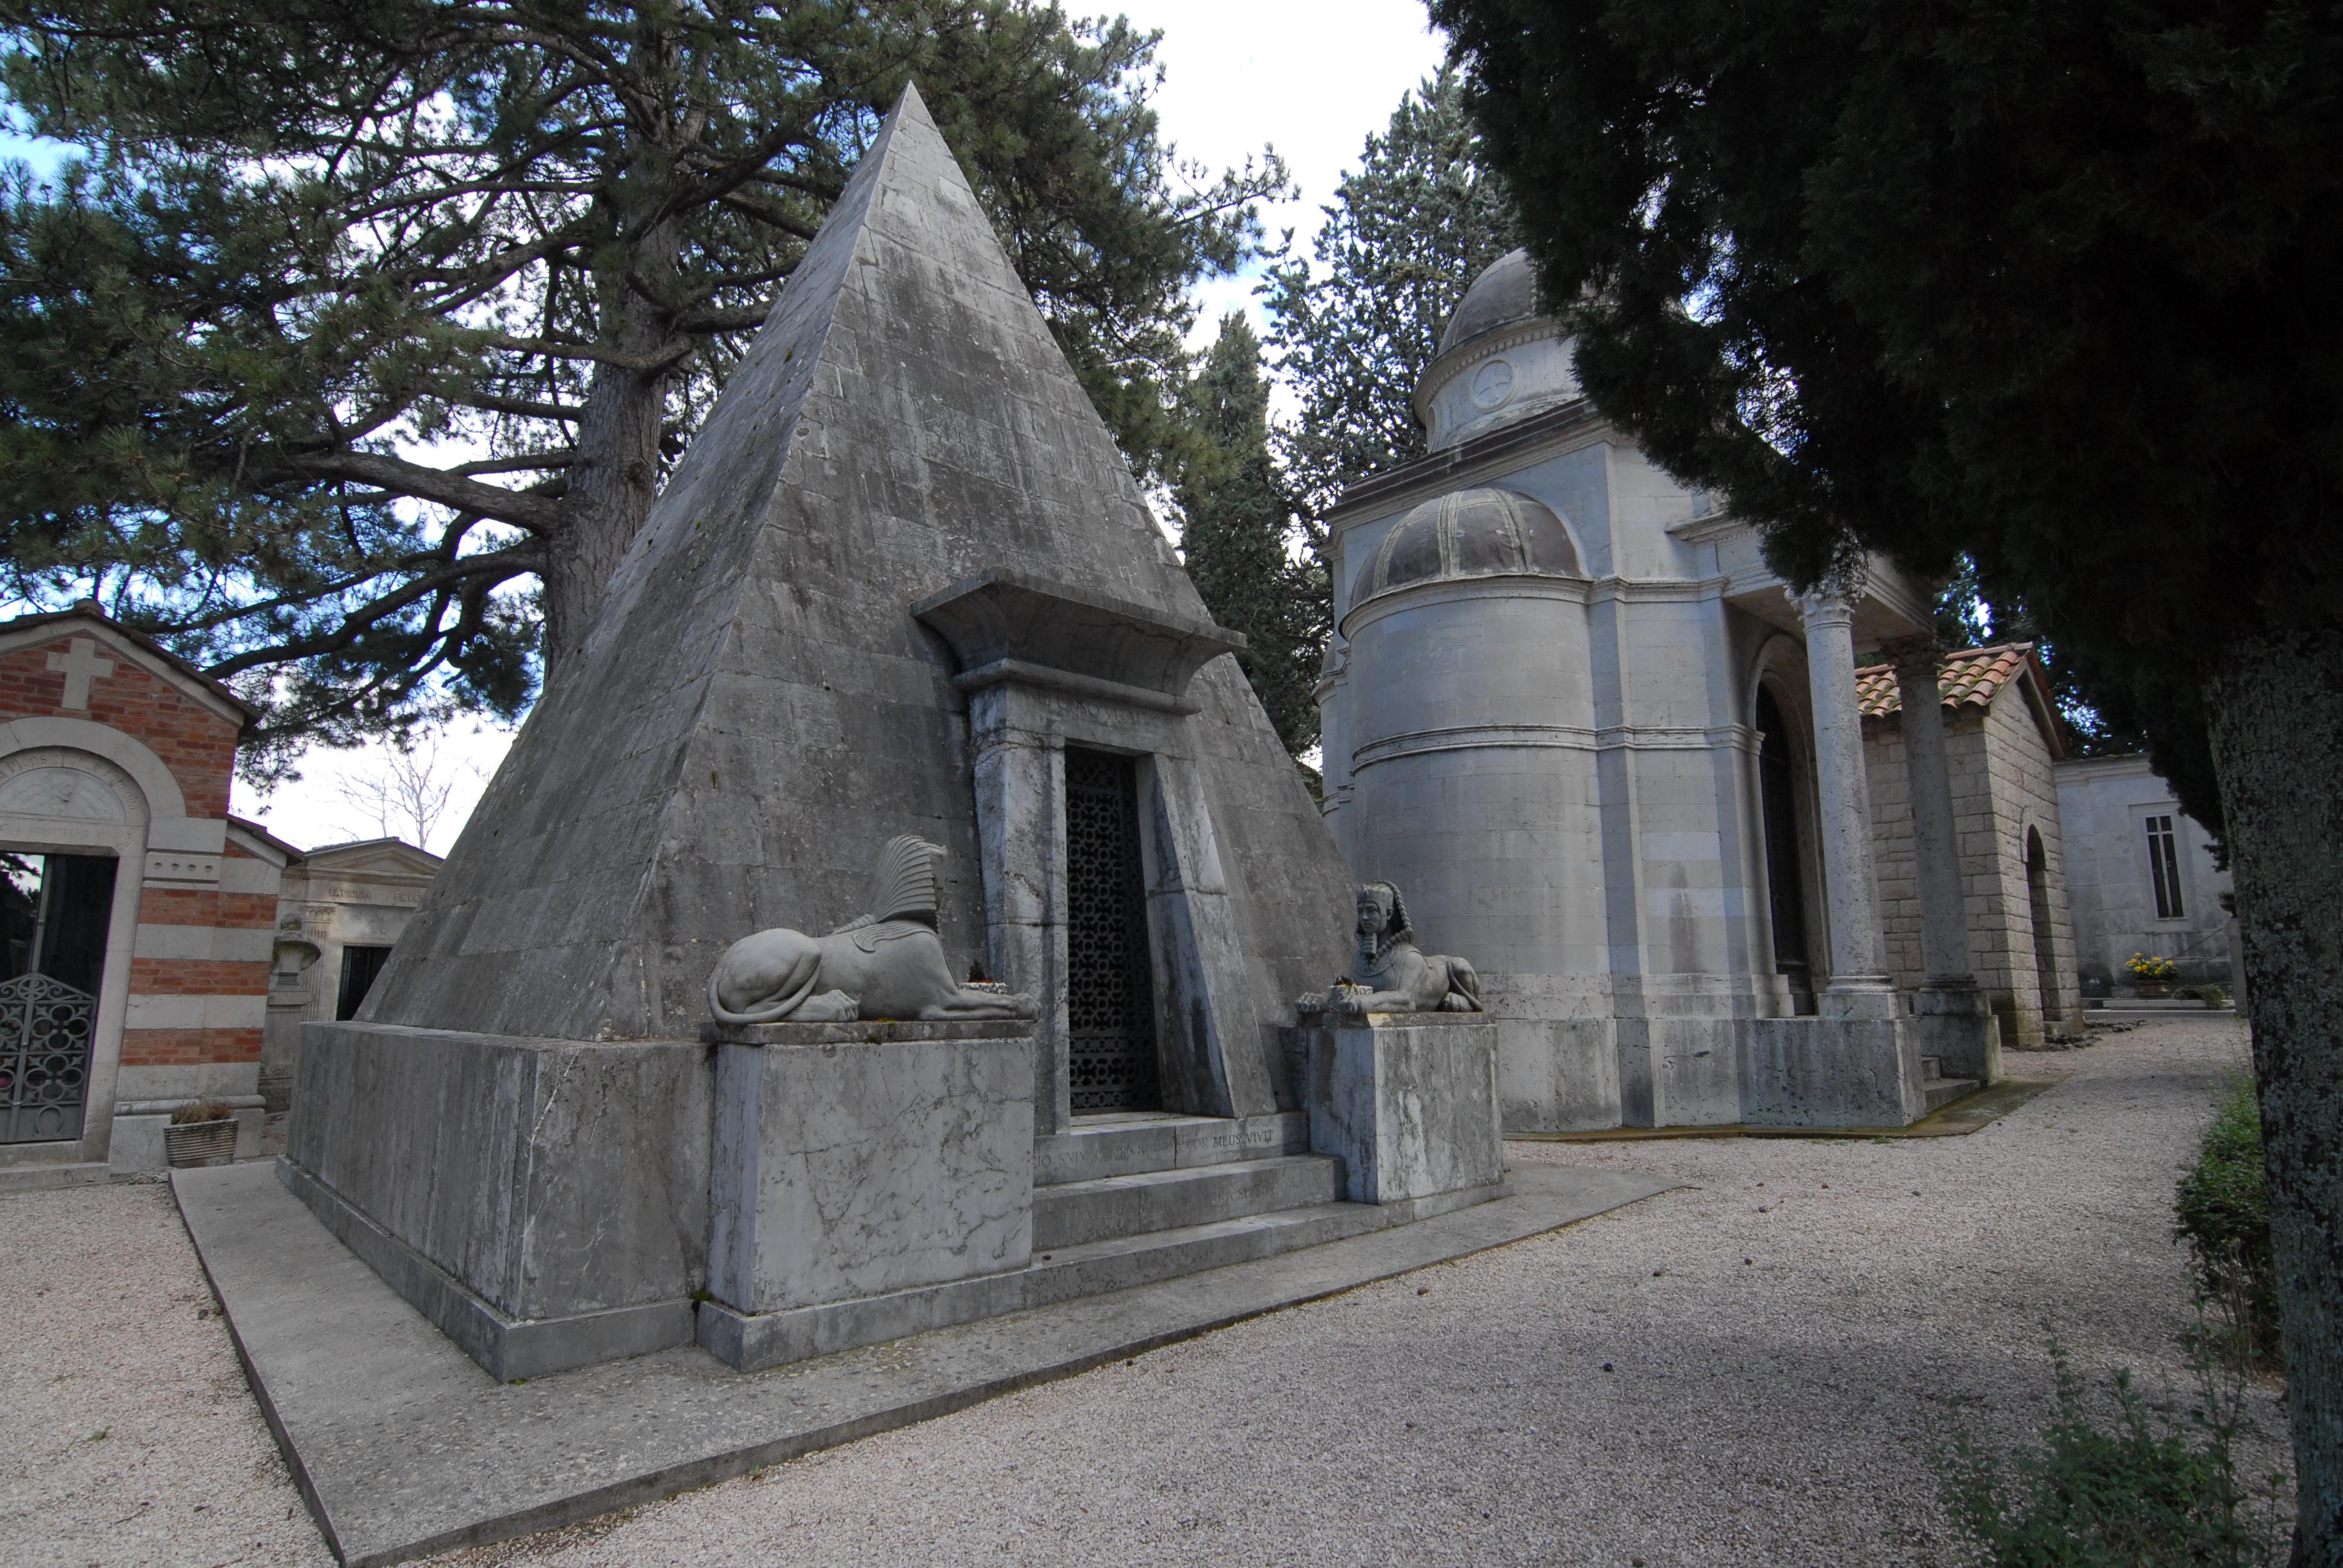 Mount vesuvius tomb jesus yes a pyramid tomb in perugia